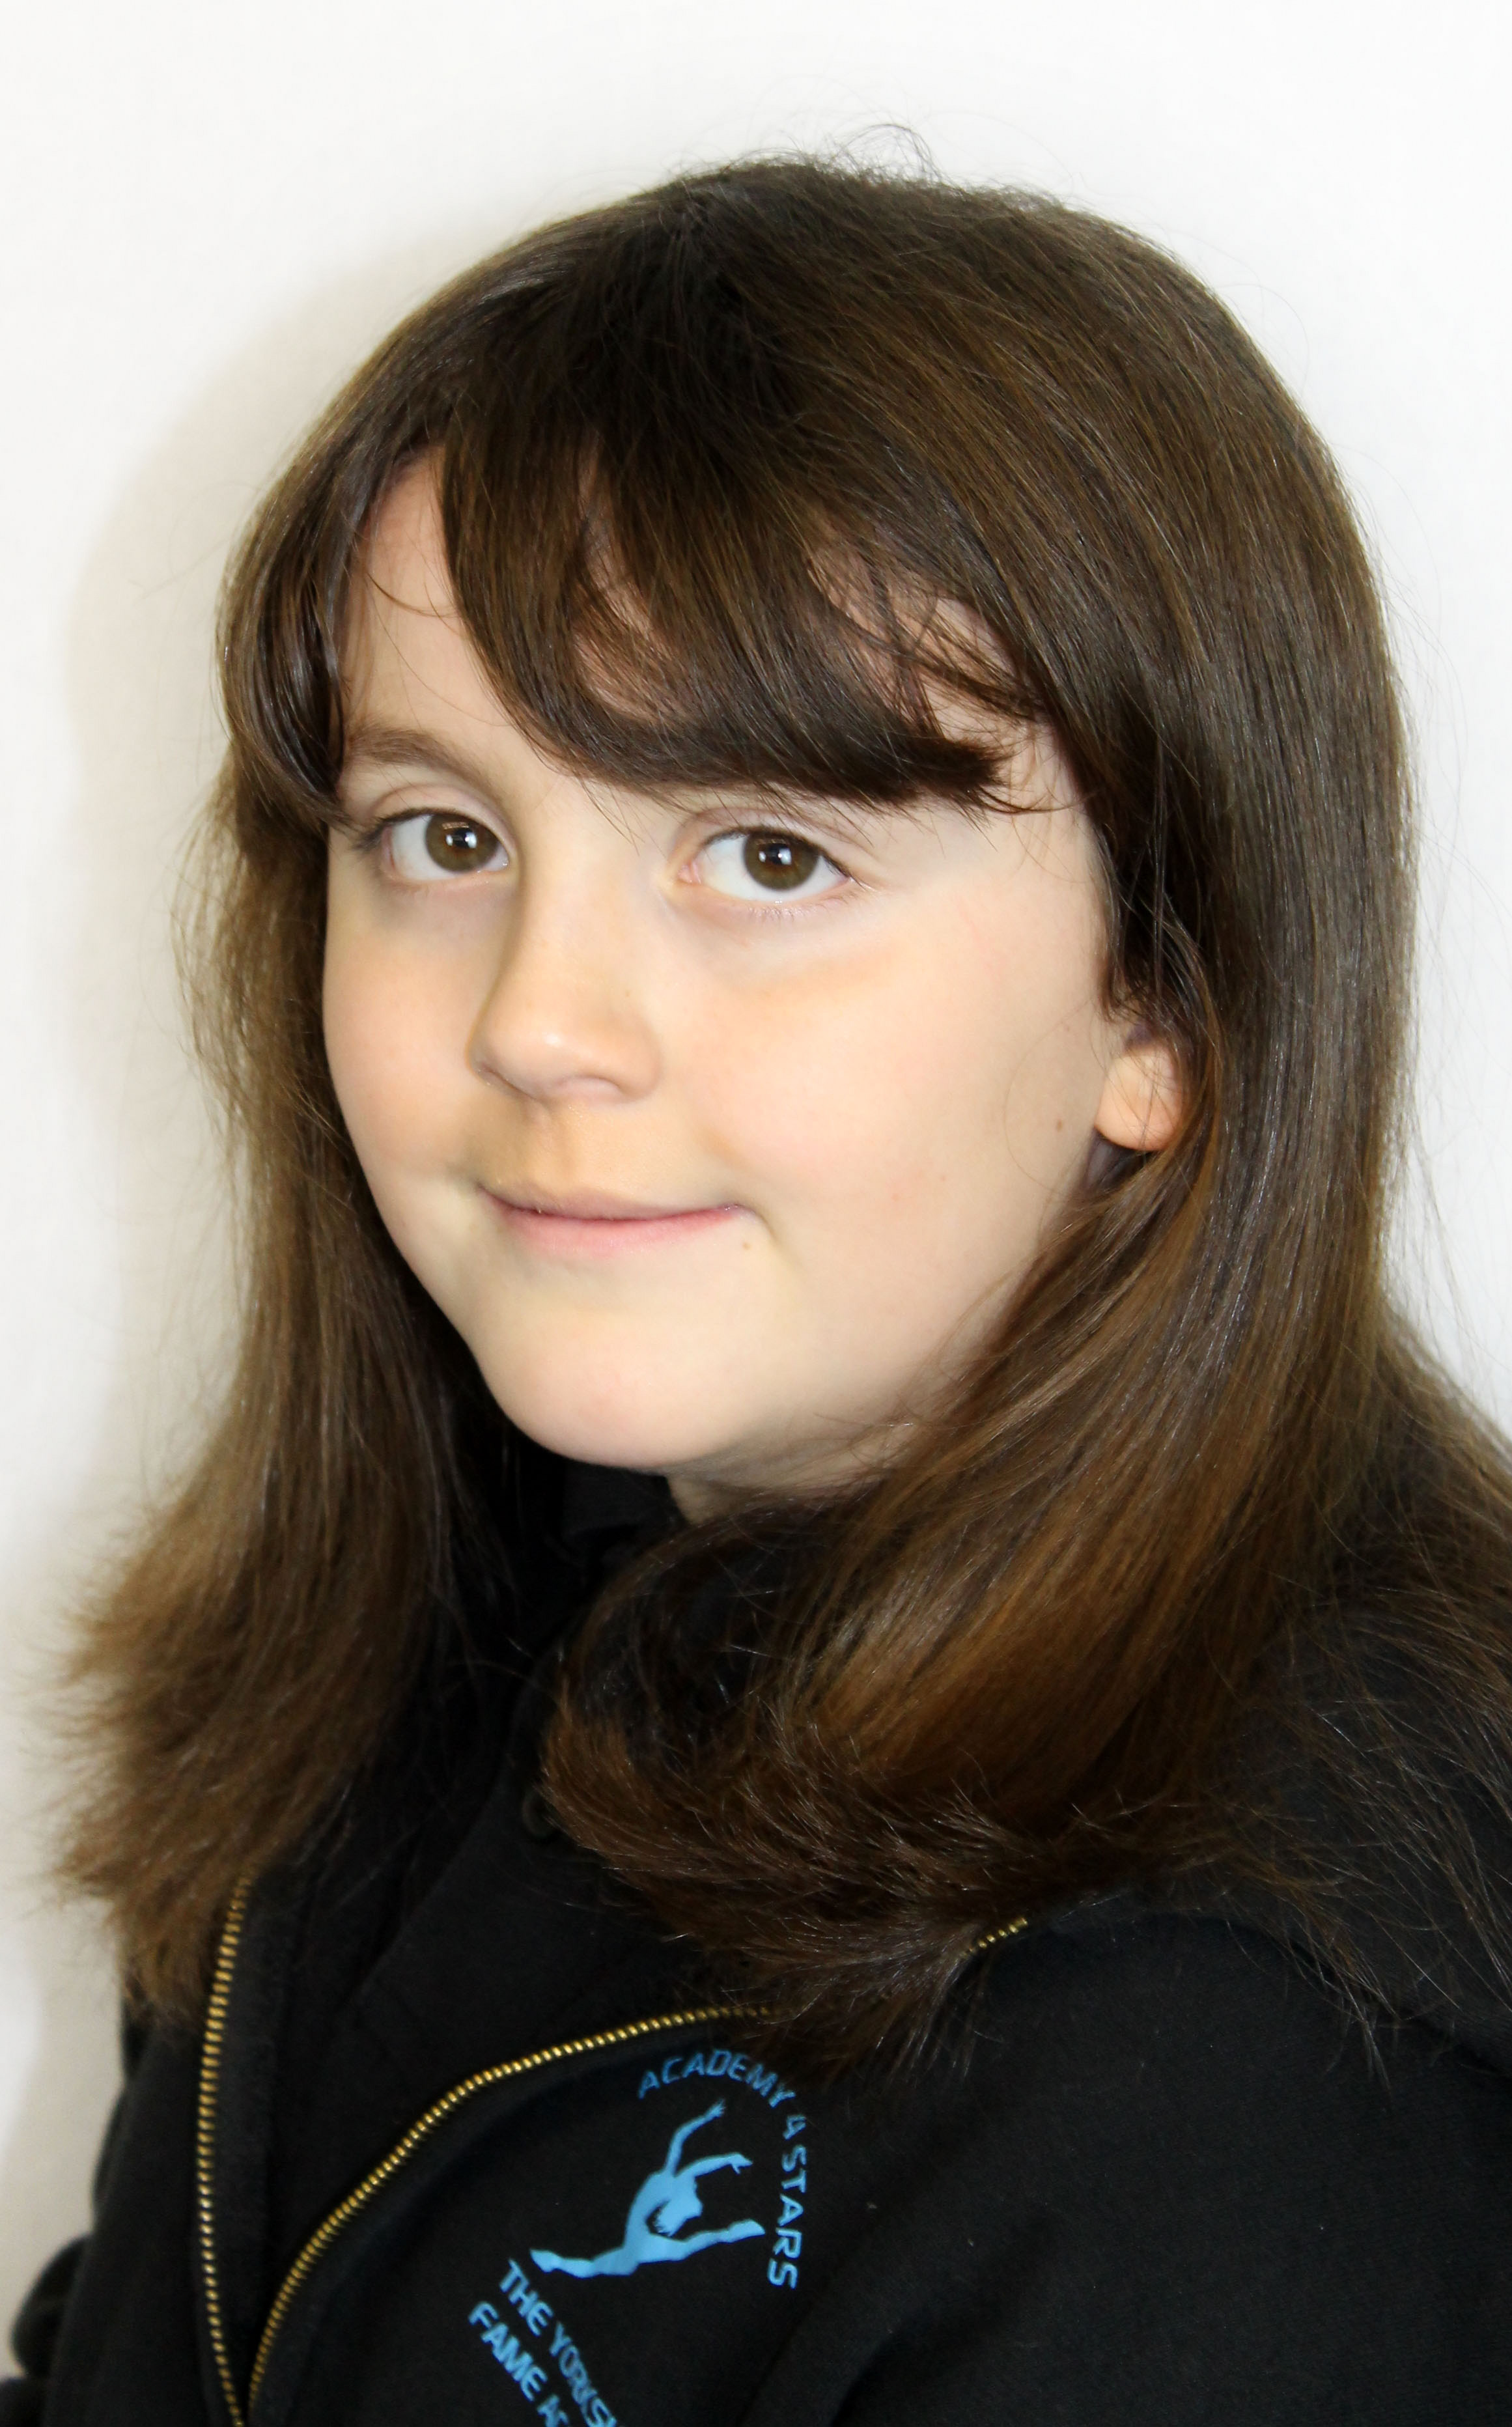 Mackenzie Robinson